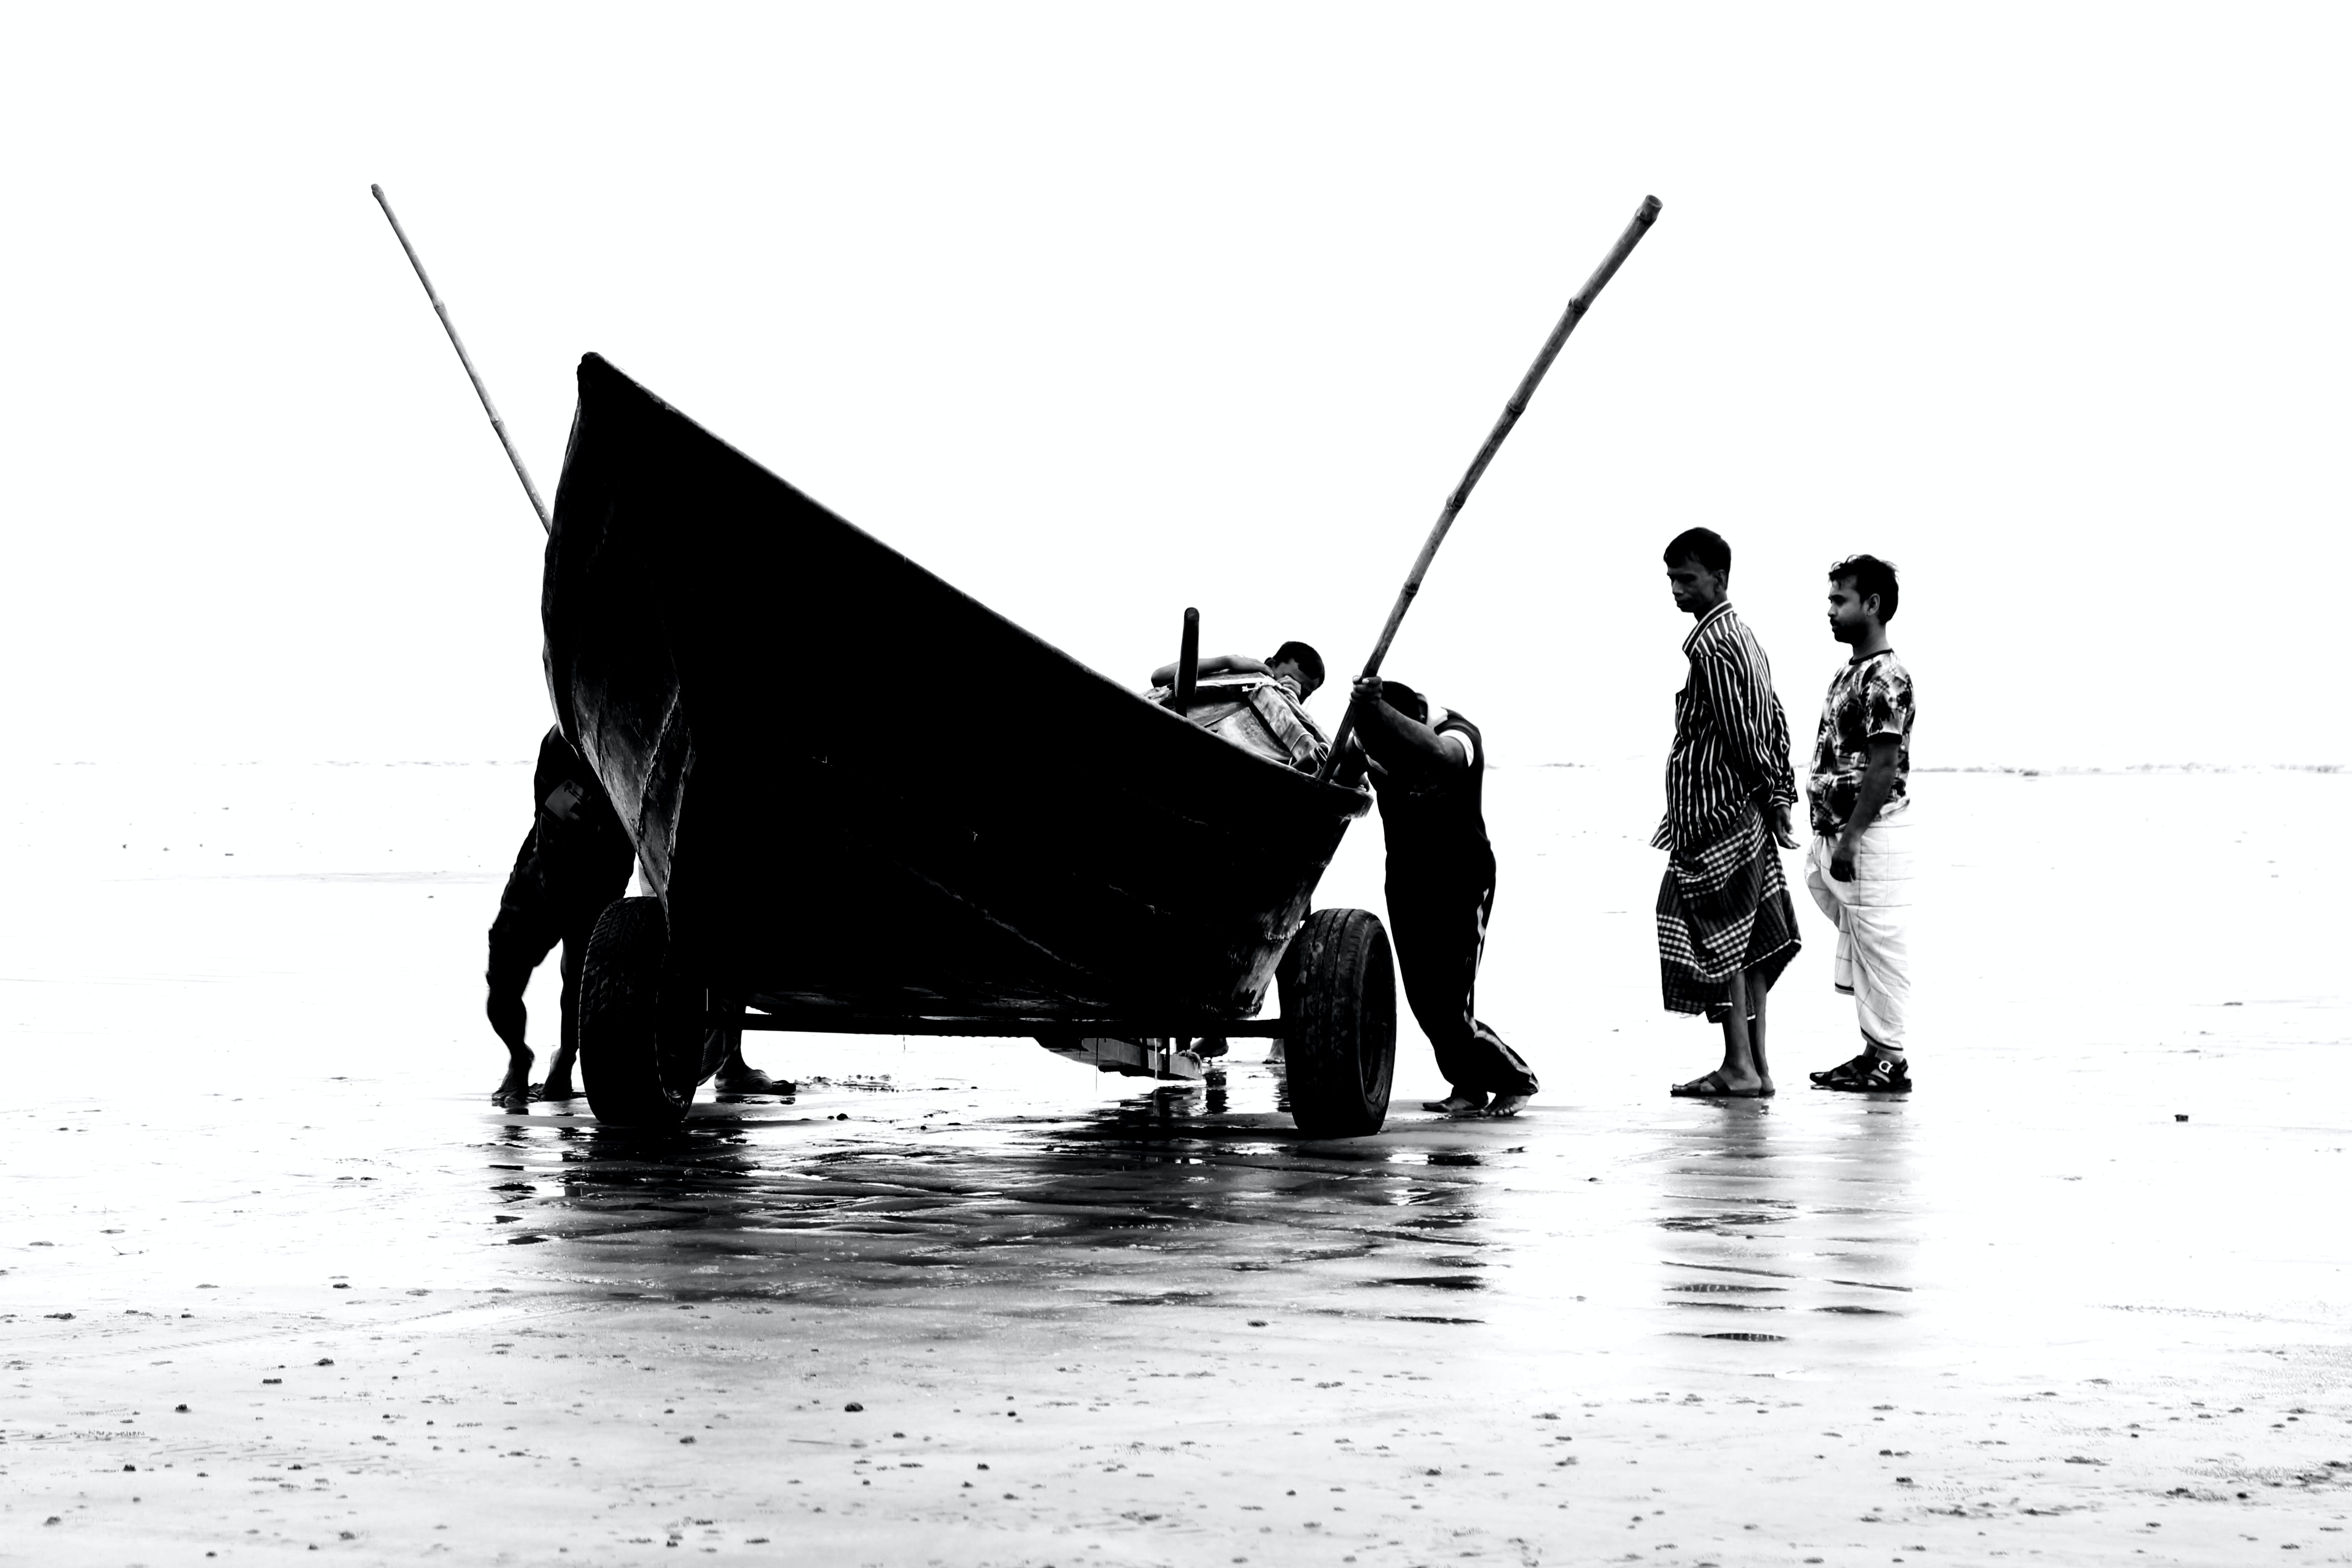 Black Outboard Boat